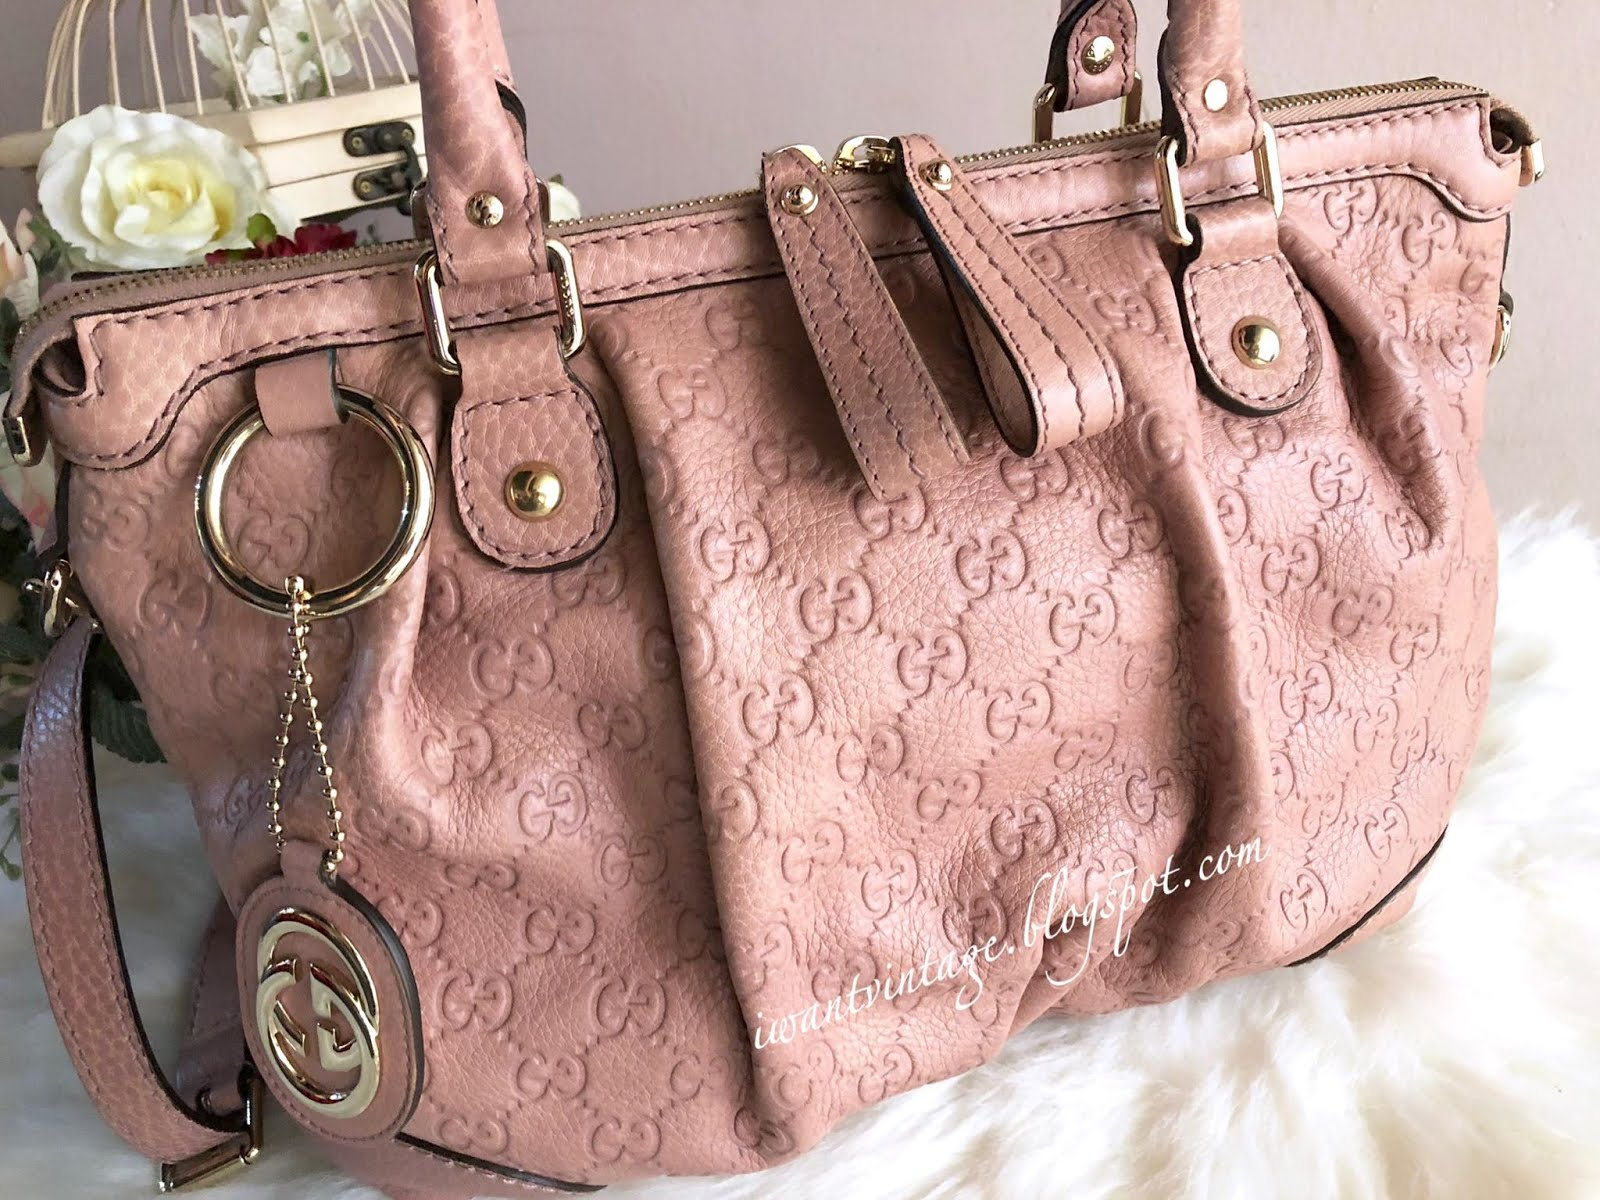 d4349ab17894 I Want Vintage   Vintage Designer Handbags: Gucci Sukey Guccissima ...